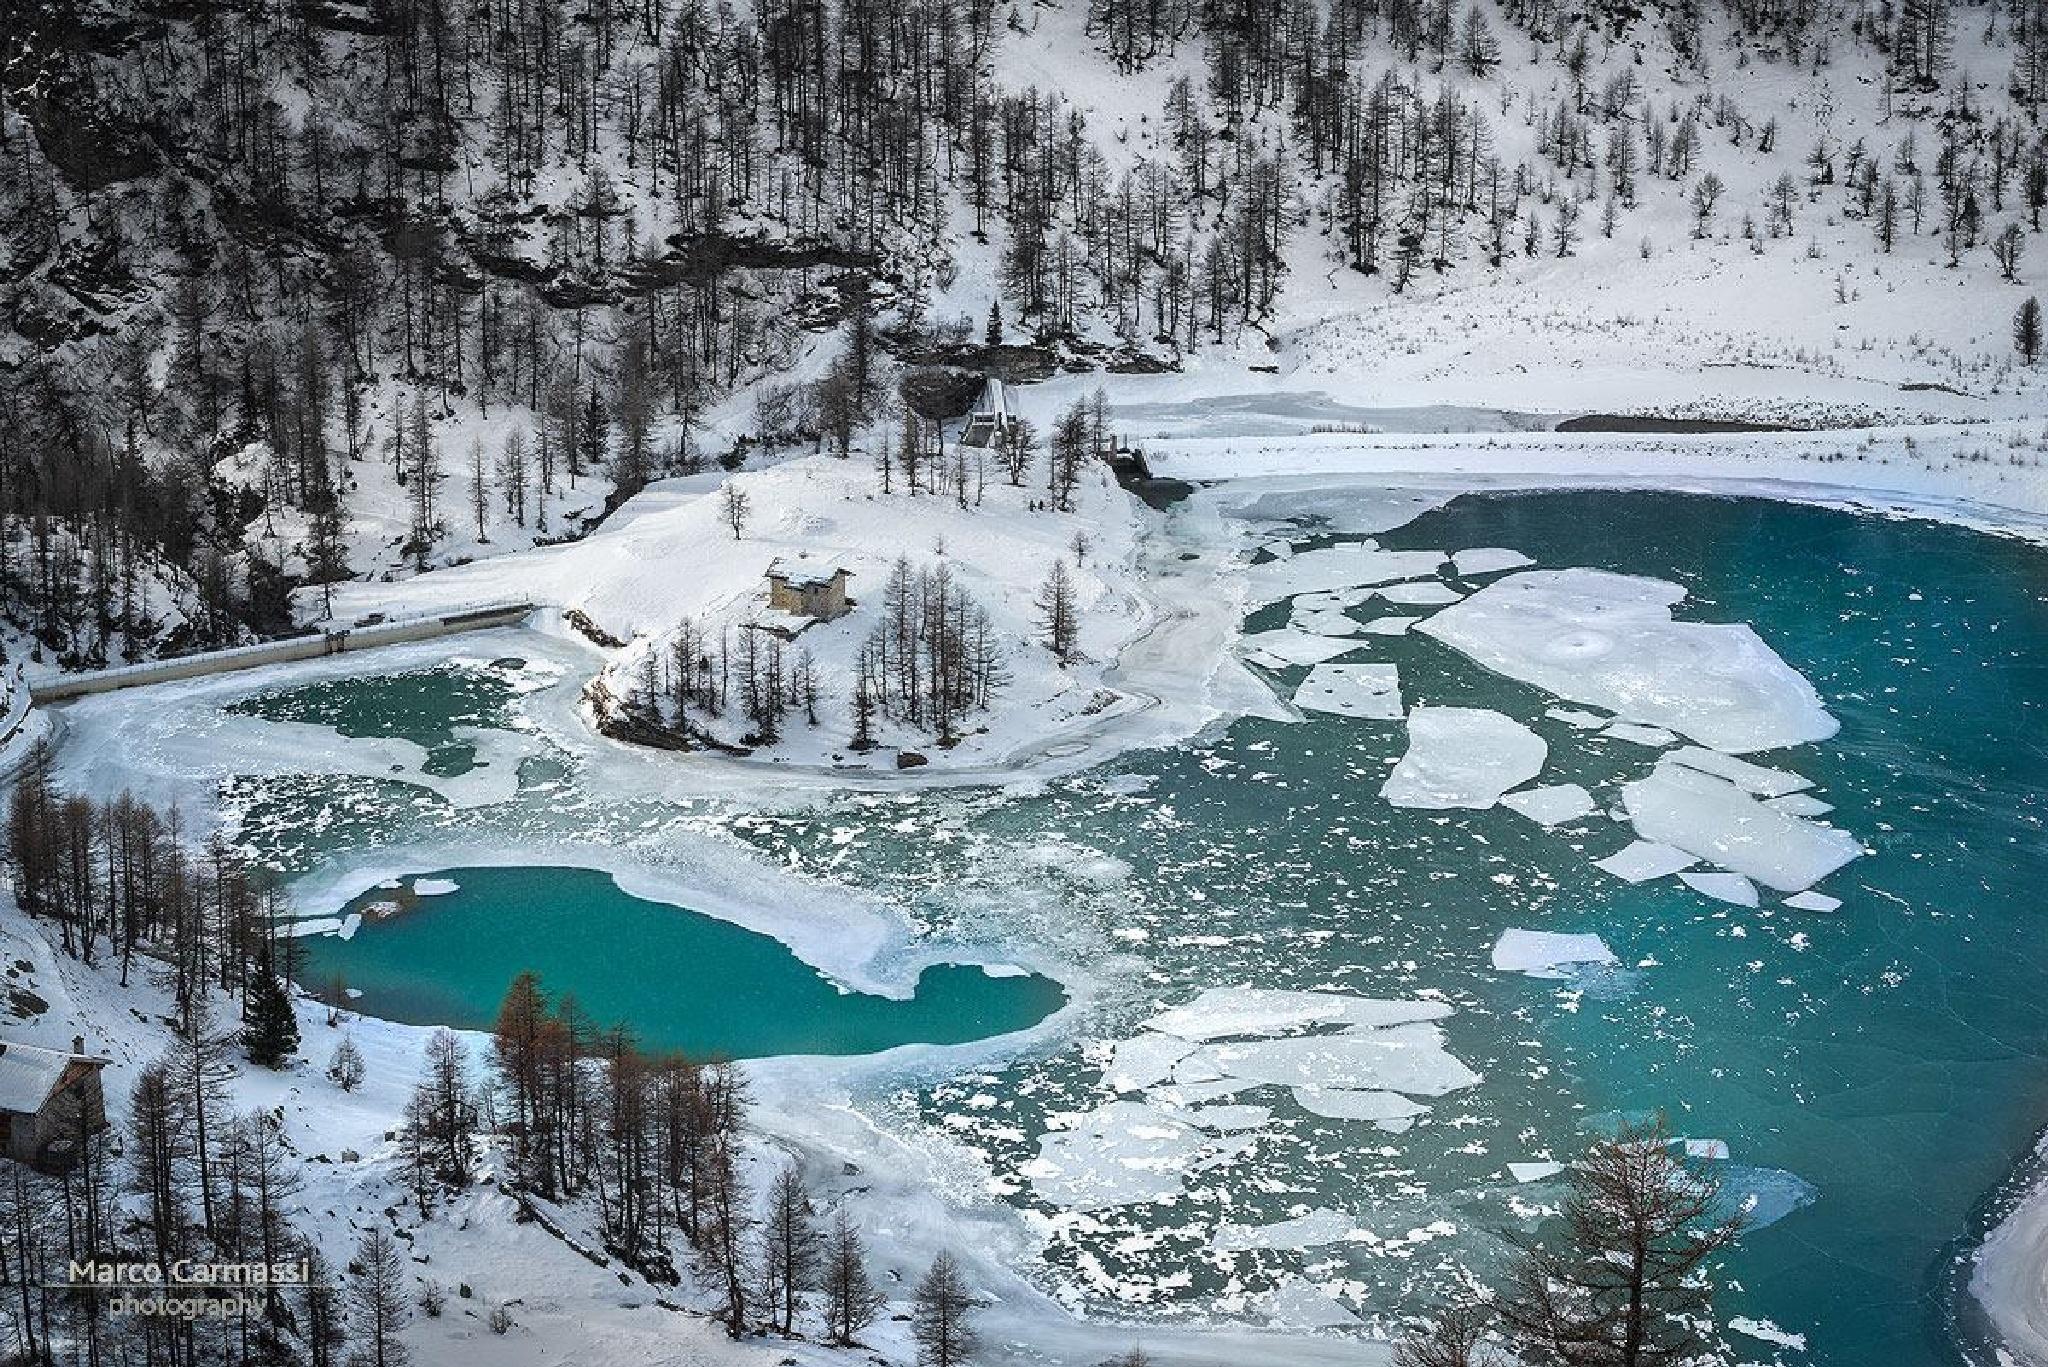 Alp Grüm Switzerland (Lake view) by marco_carmassi